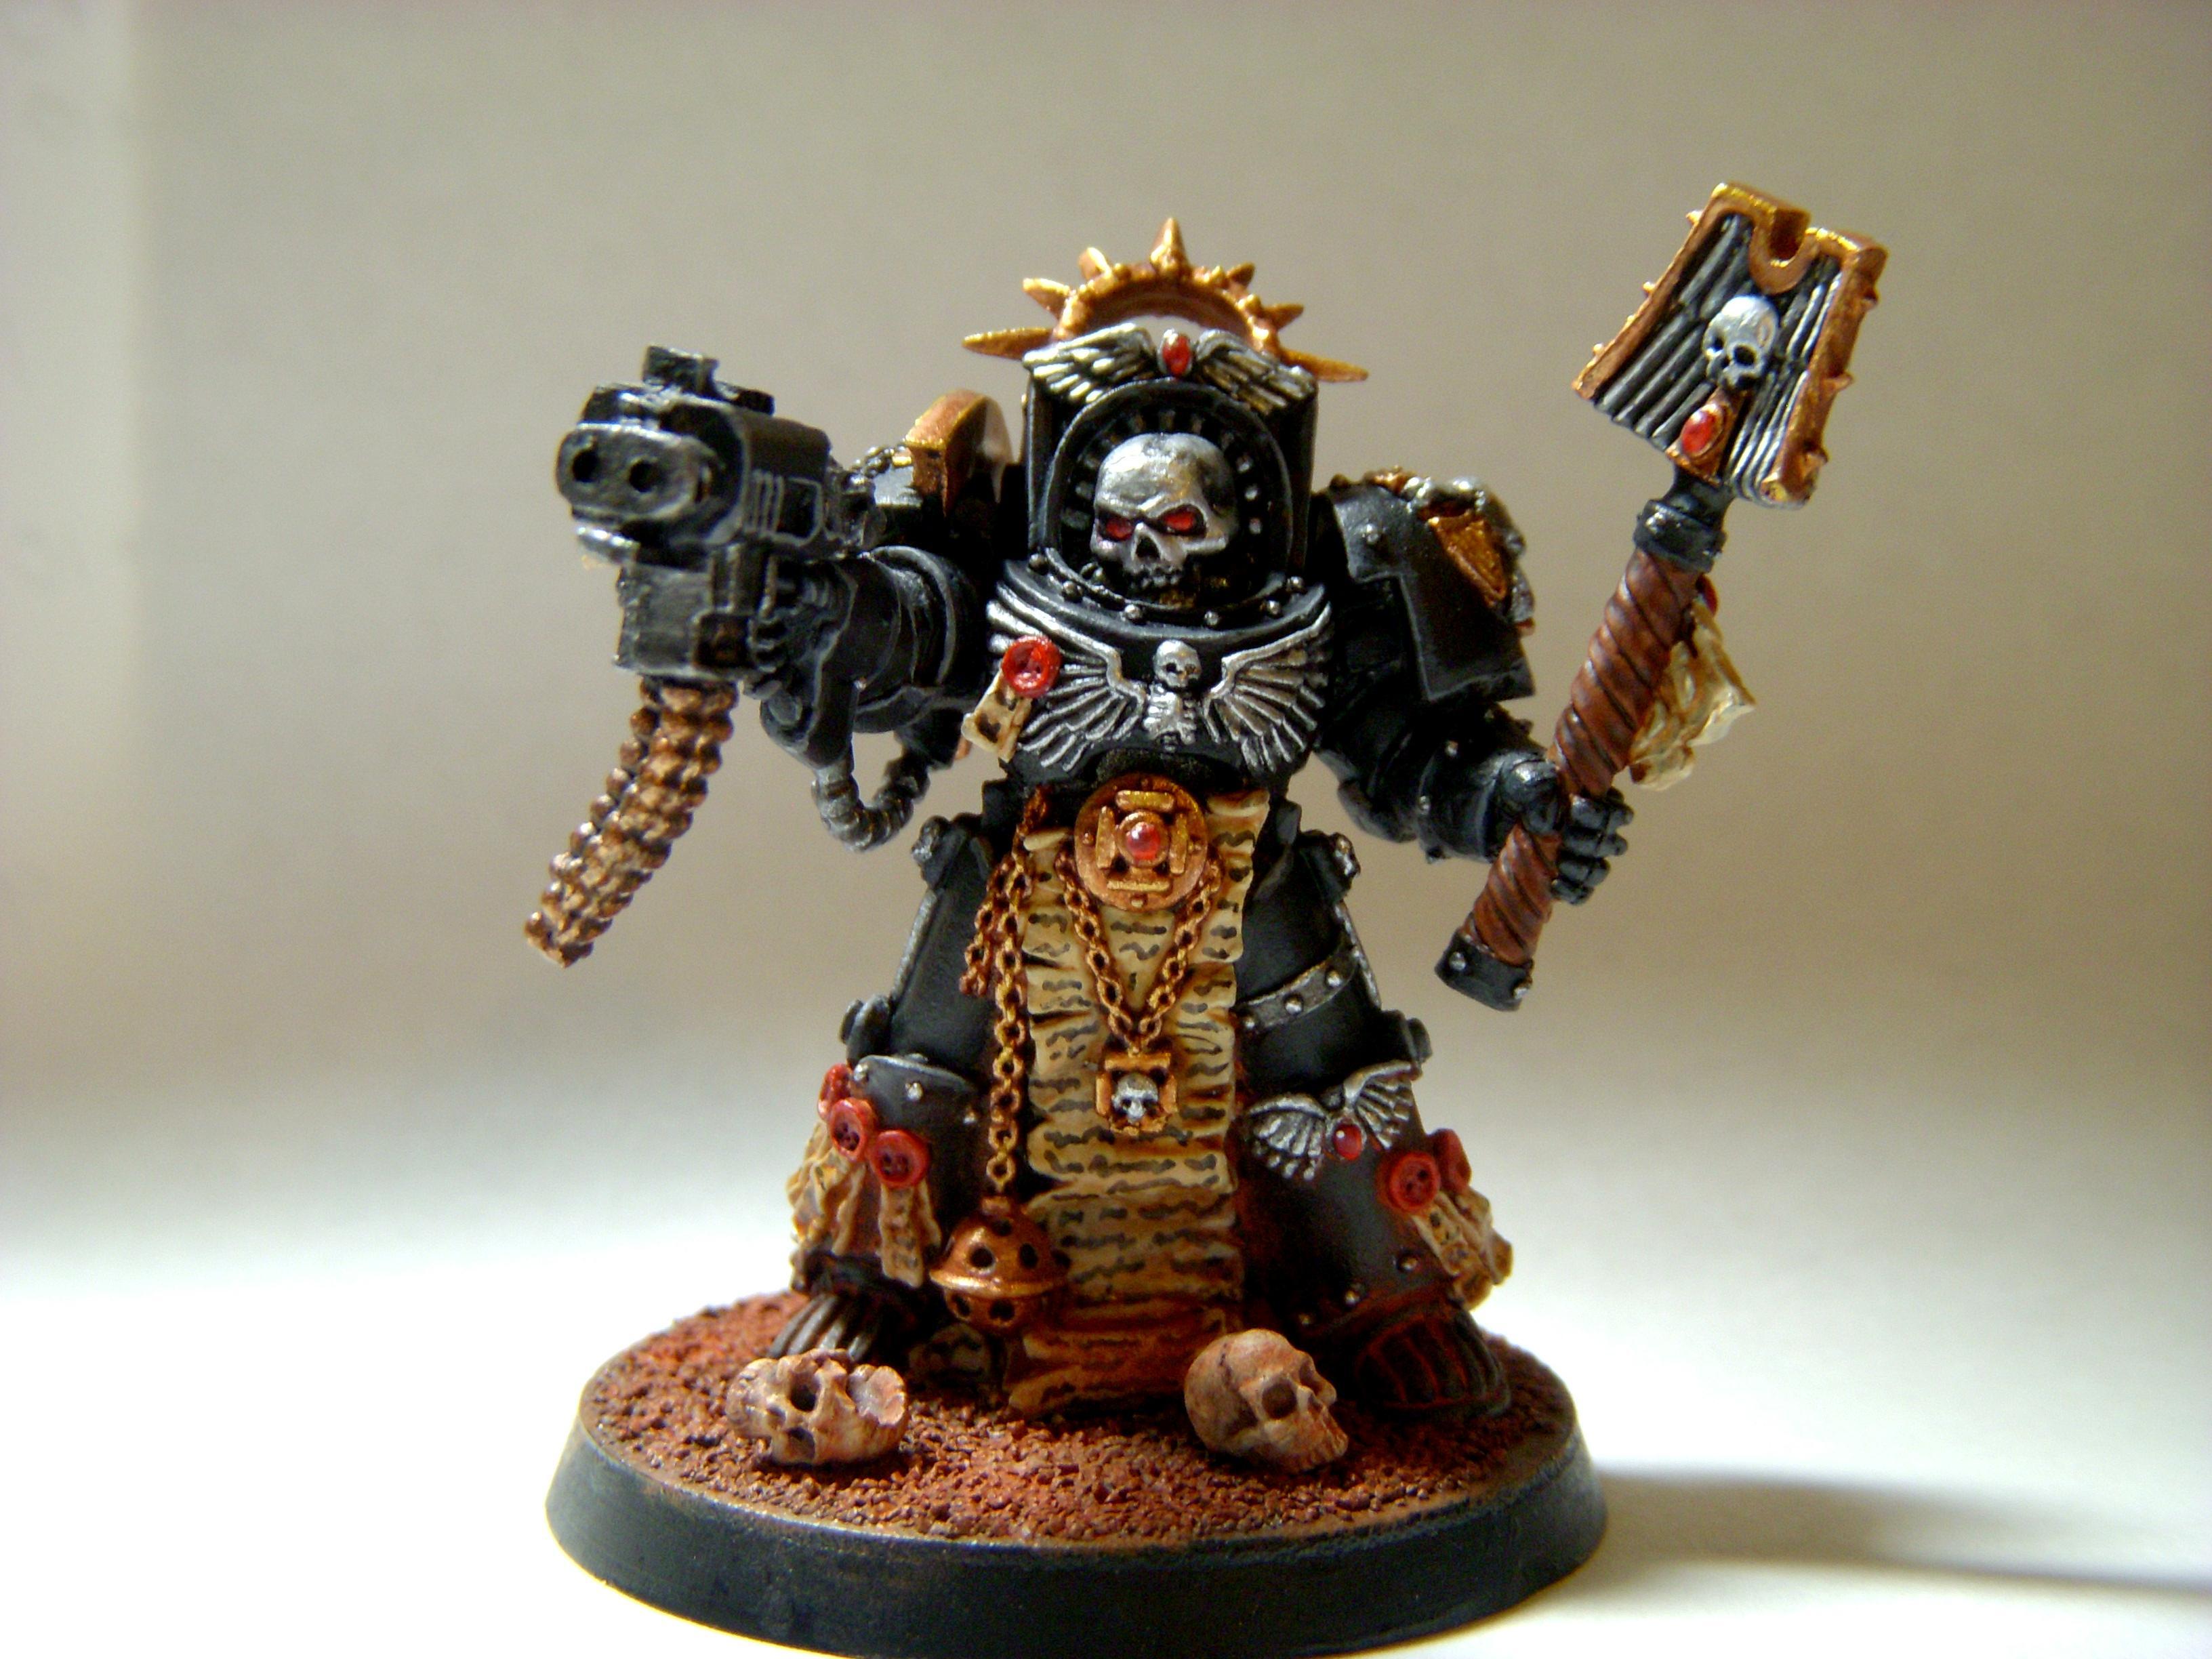 Chaplain, Silver, Silverskulls, Skull, Terminator Armor